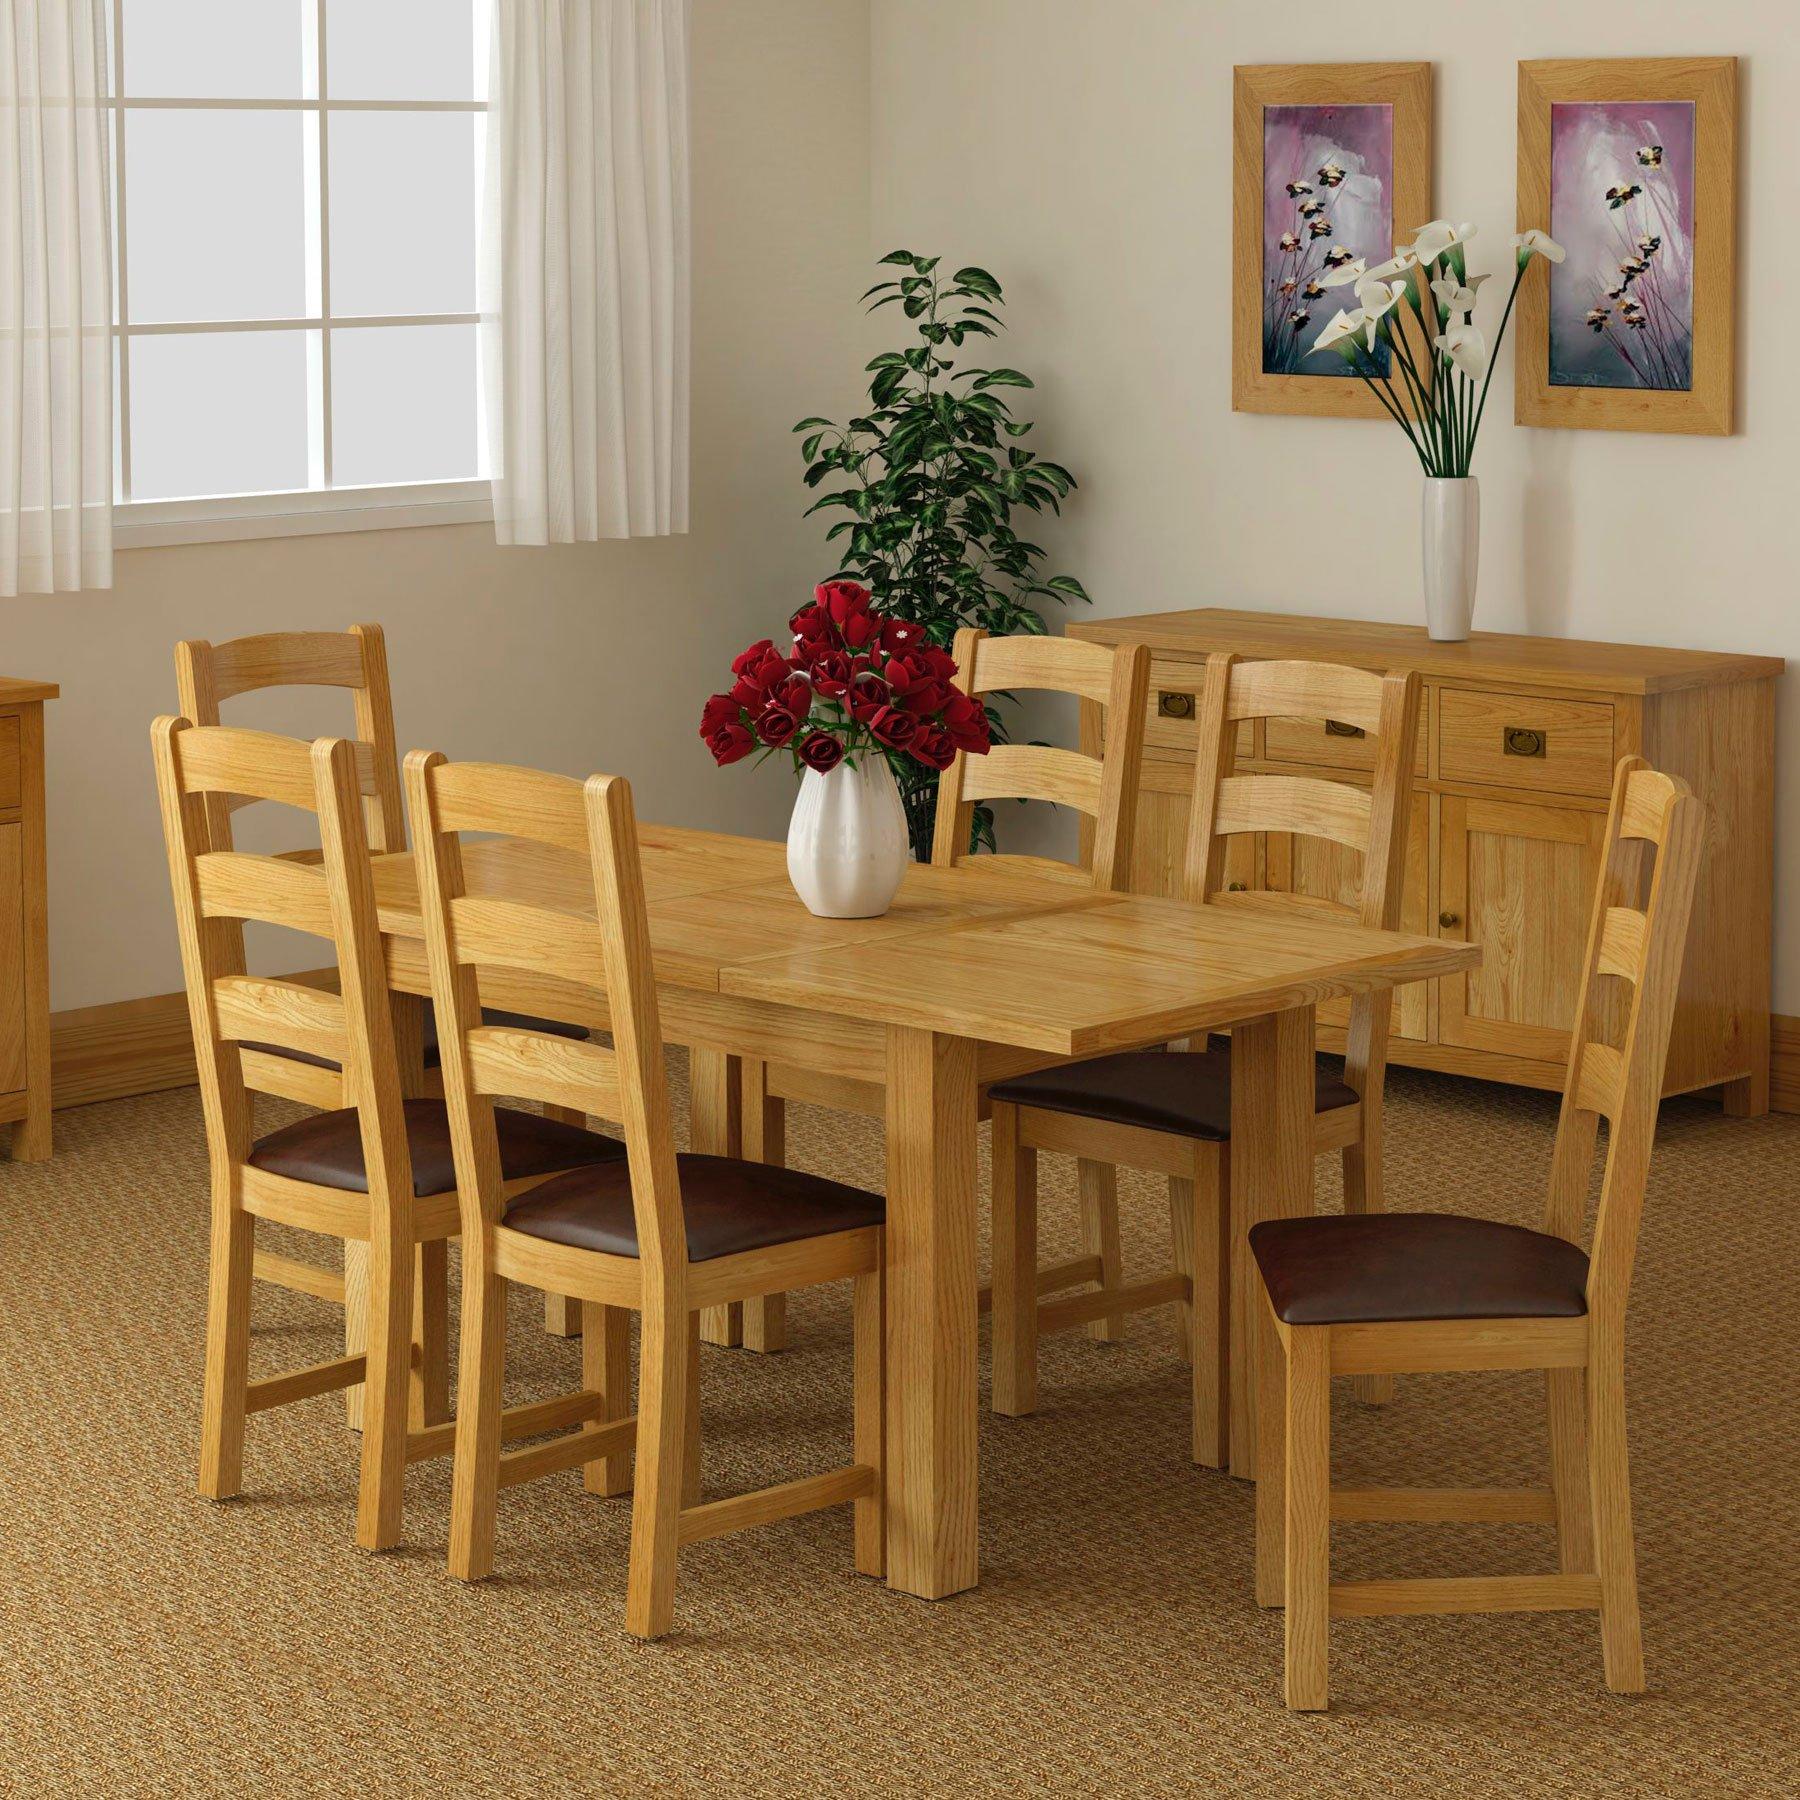 Dorset Light Oak Extending Dining Table 4 Chairs